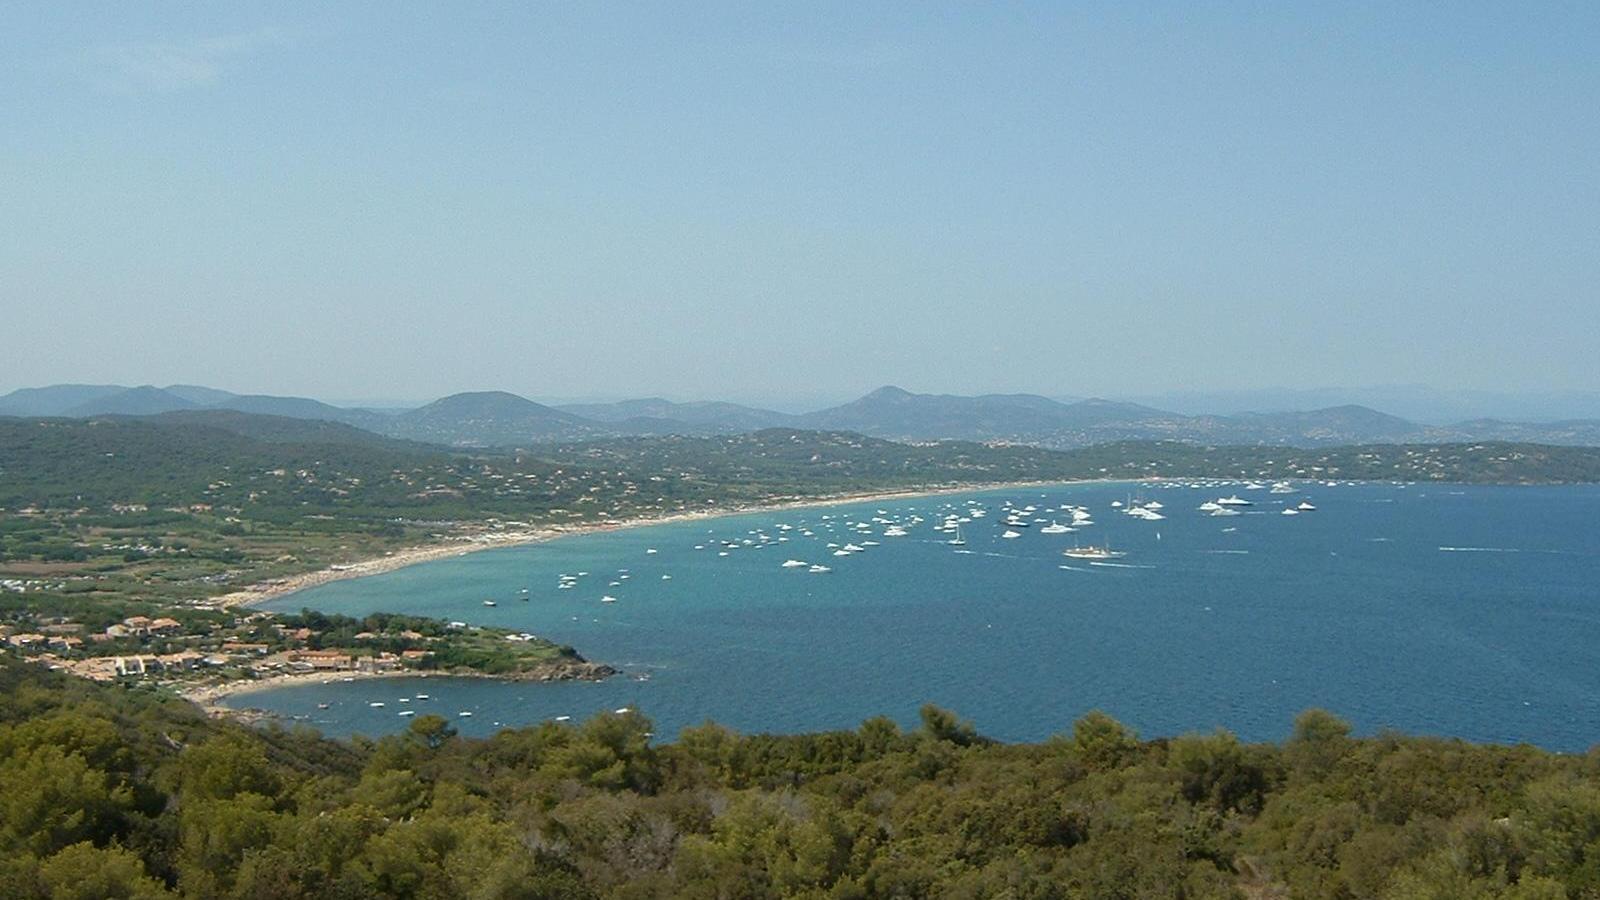 Nature flourishes at Saint-Tropez